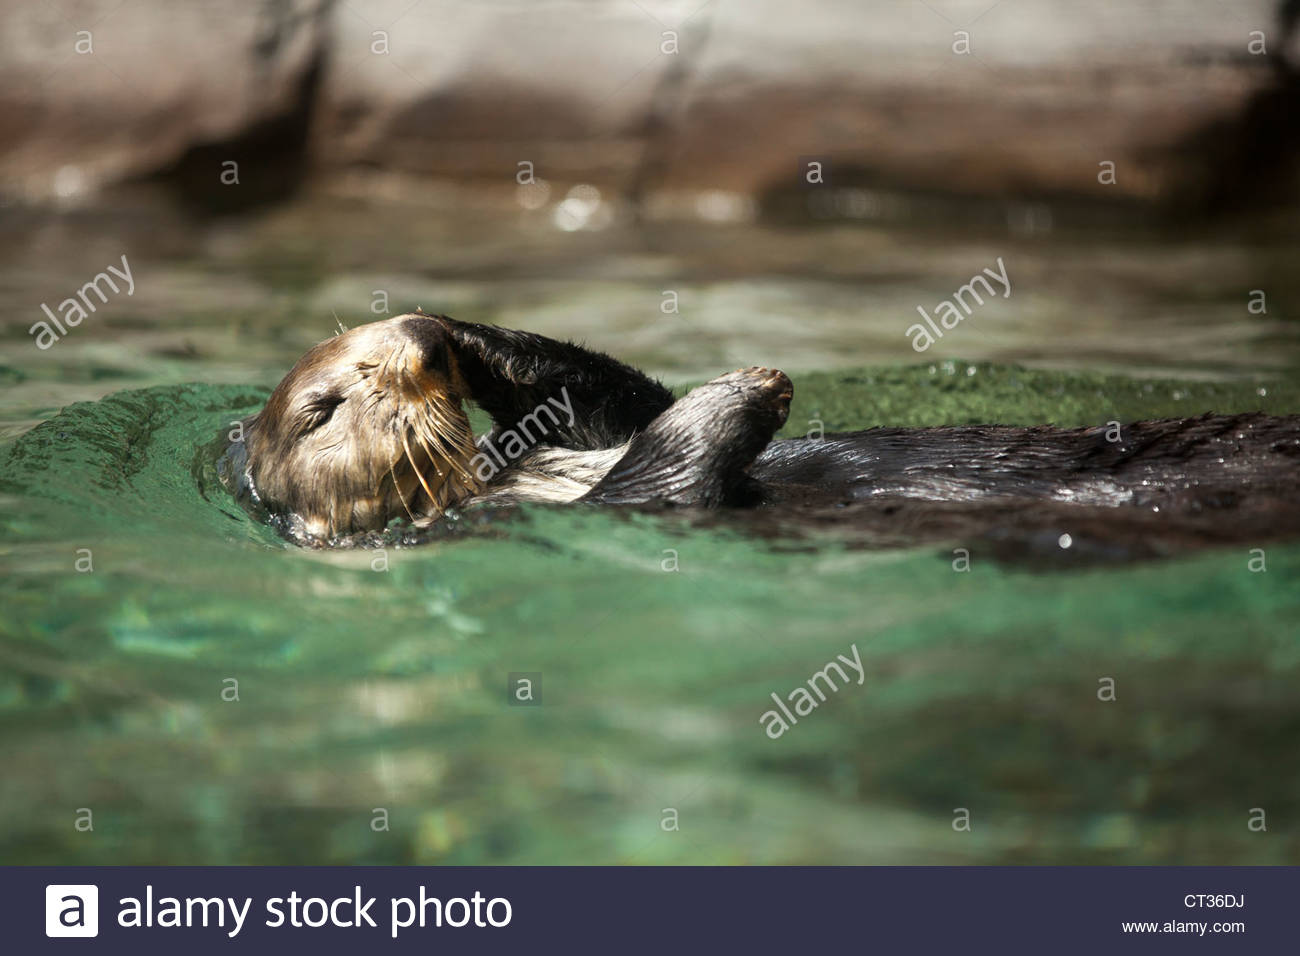 Sea Otter, Seattle Aquarium, Seattle, Washington - Stock Image